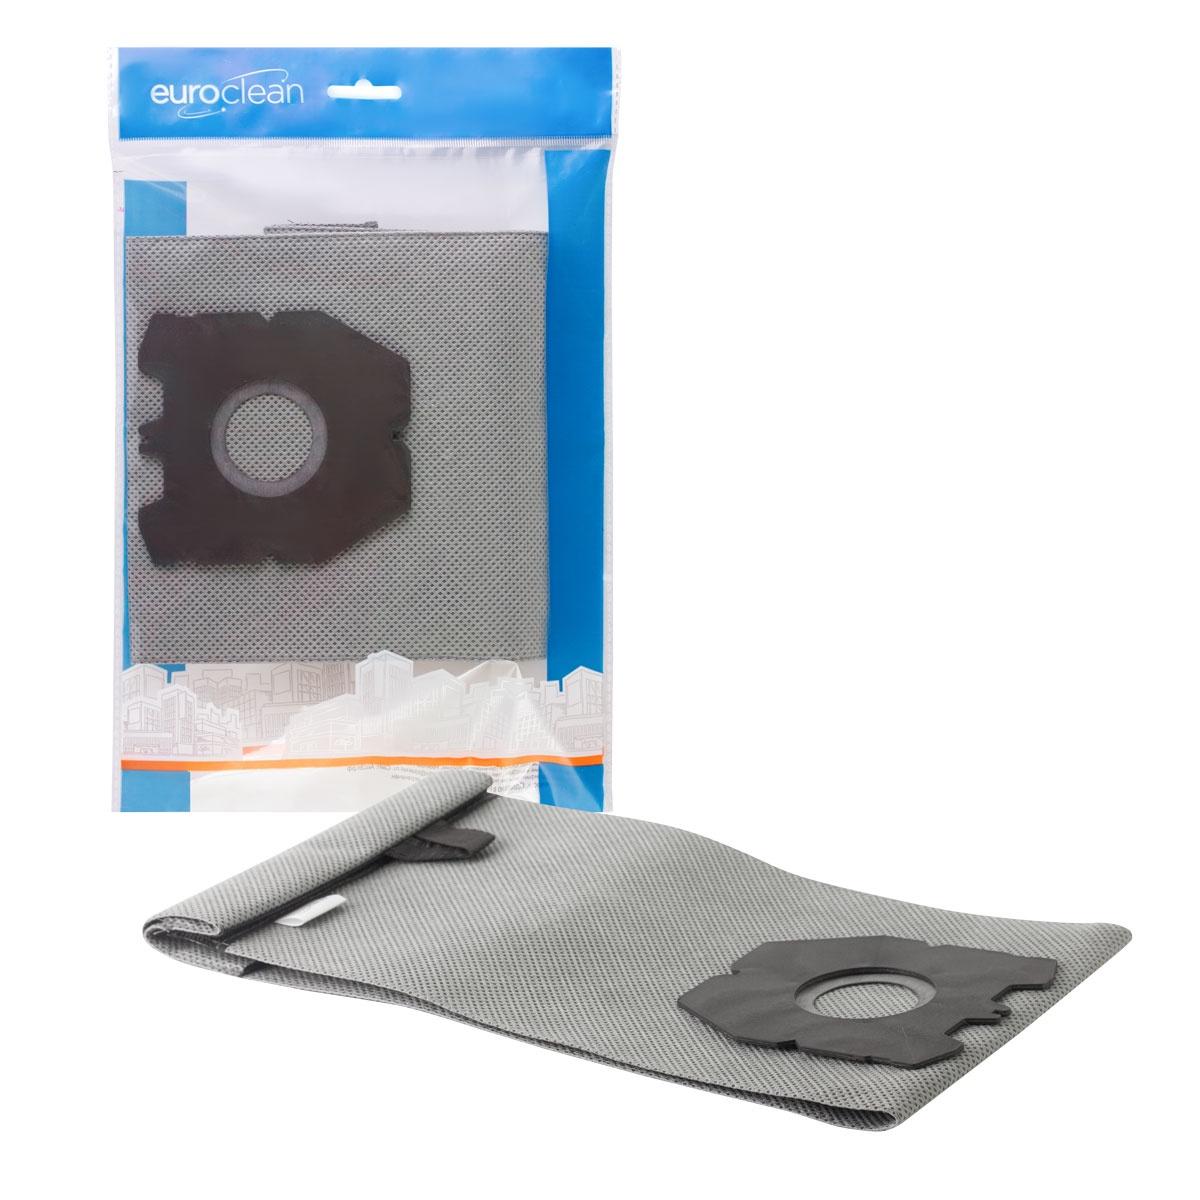 цена на EUR-54R Мешок-пылесборник Euroclean многоразовый для пылесоса